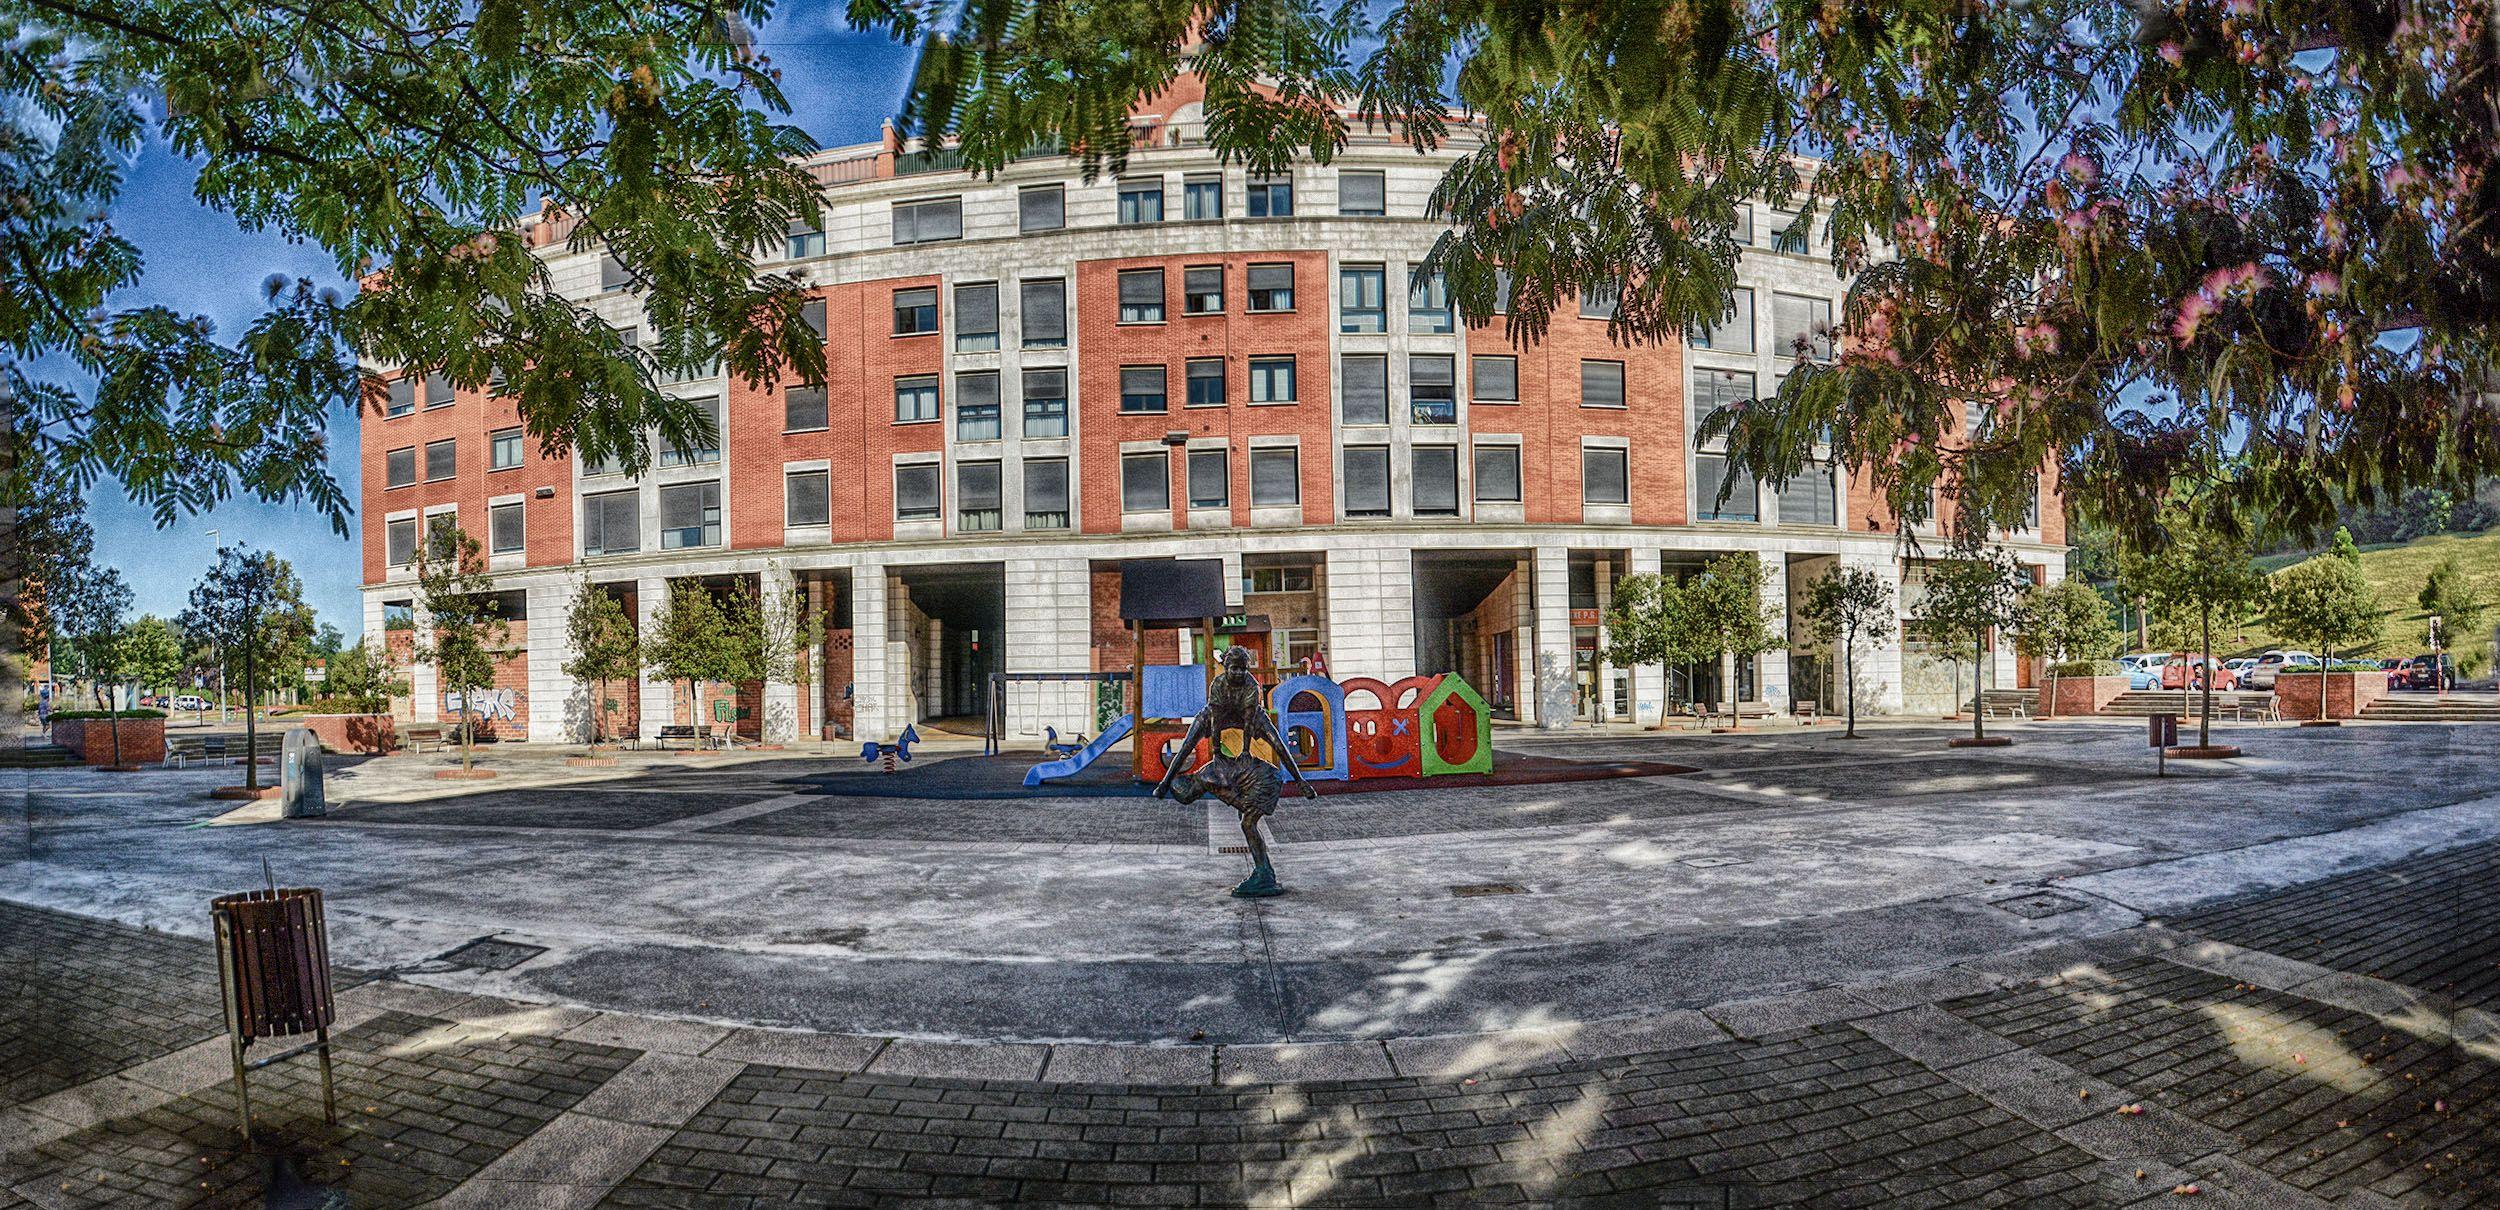 Plaza de la calle Estartetxe